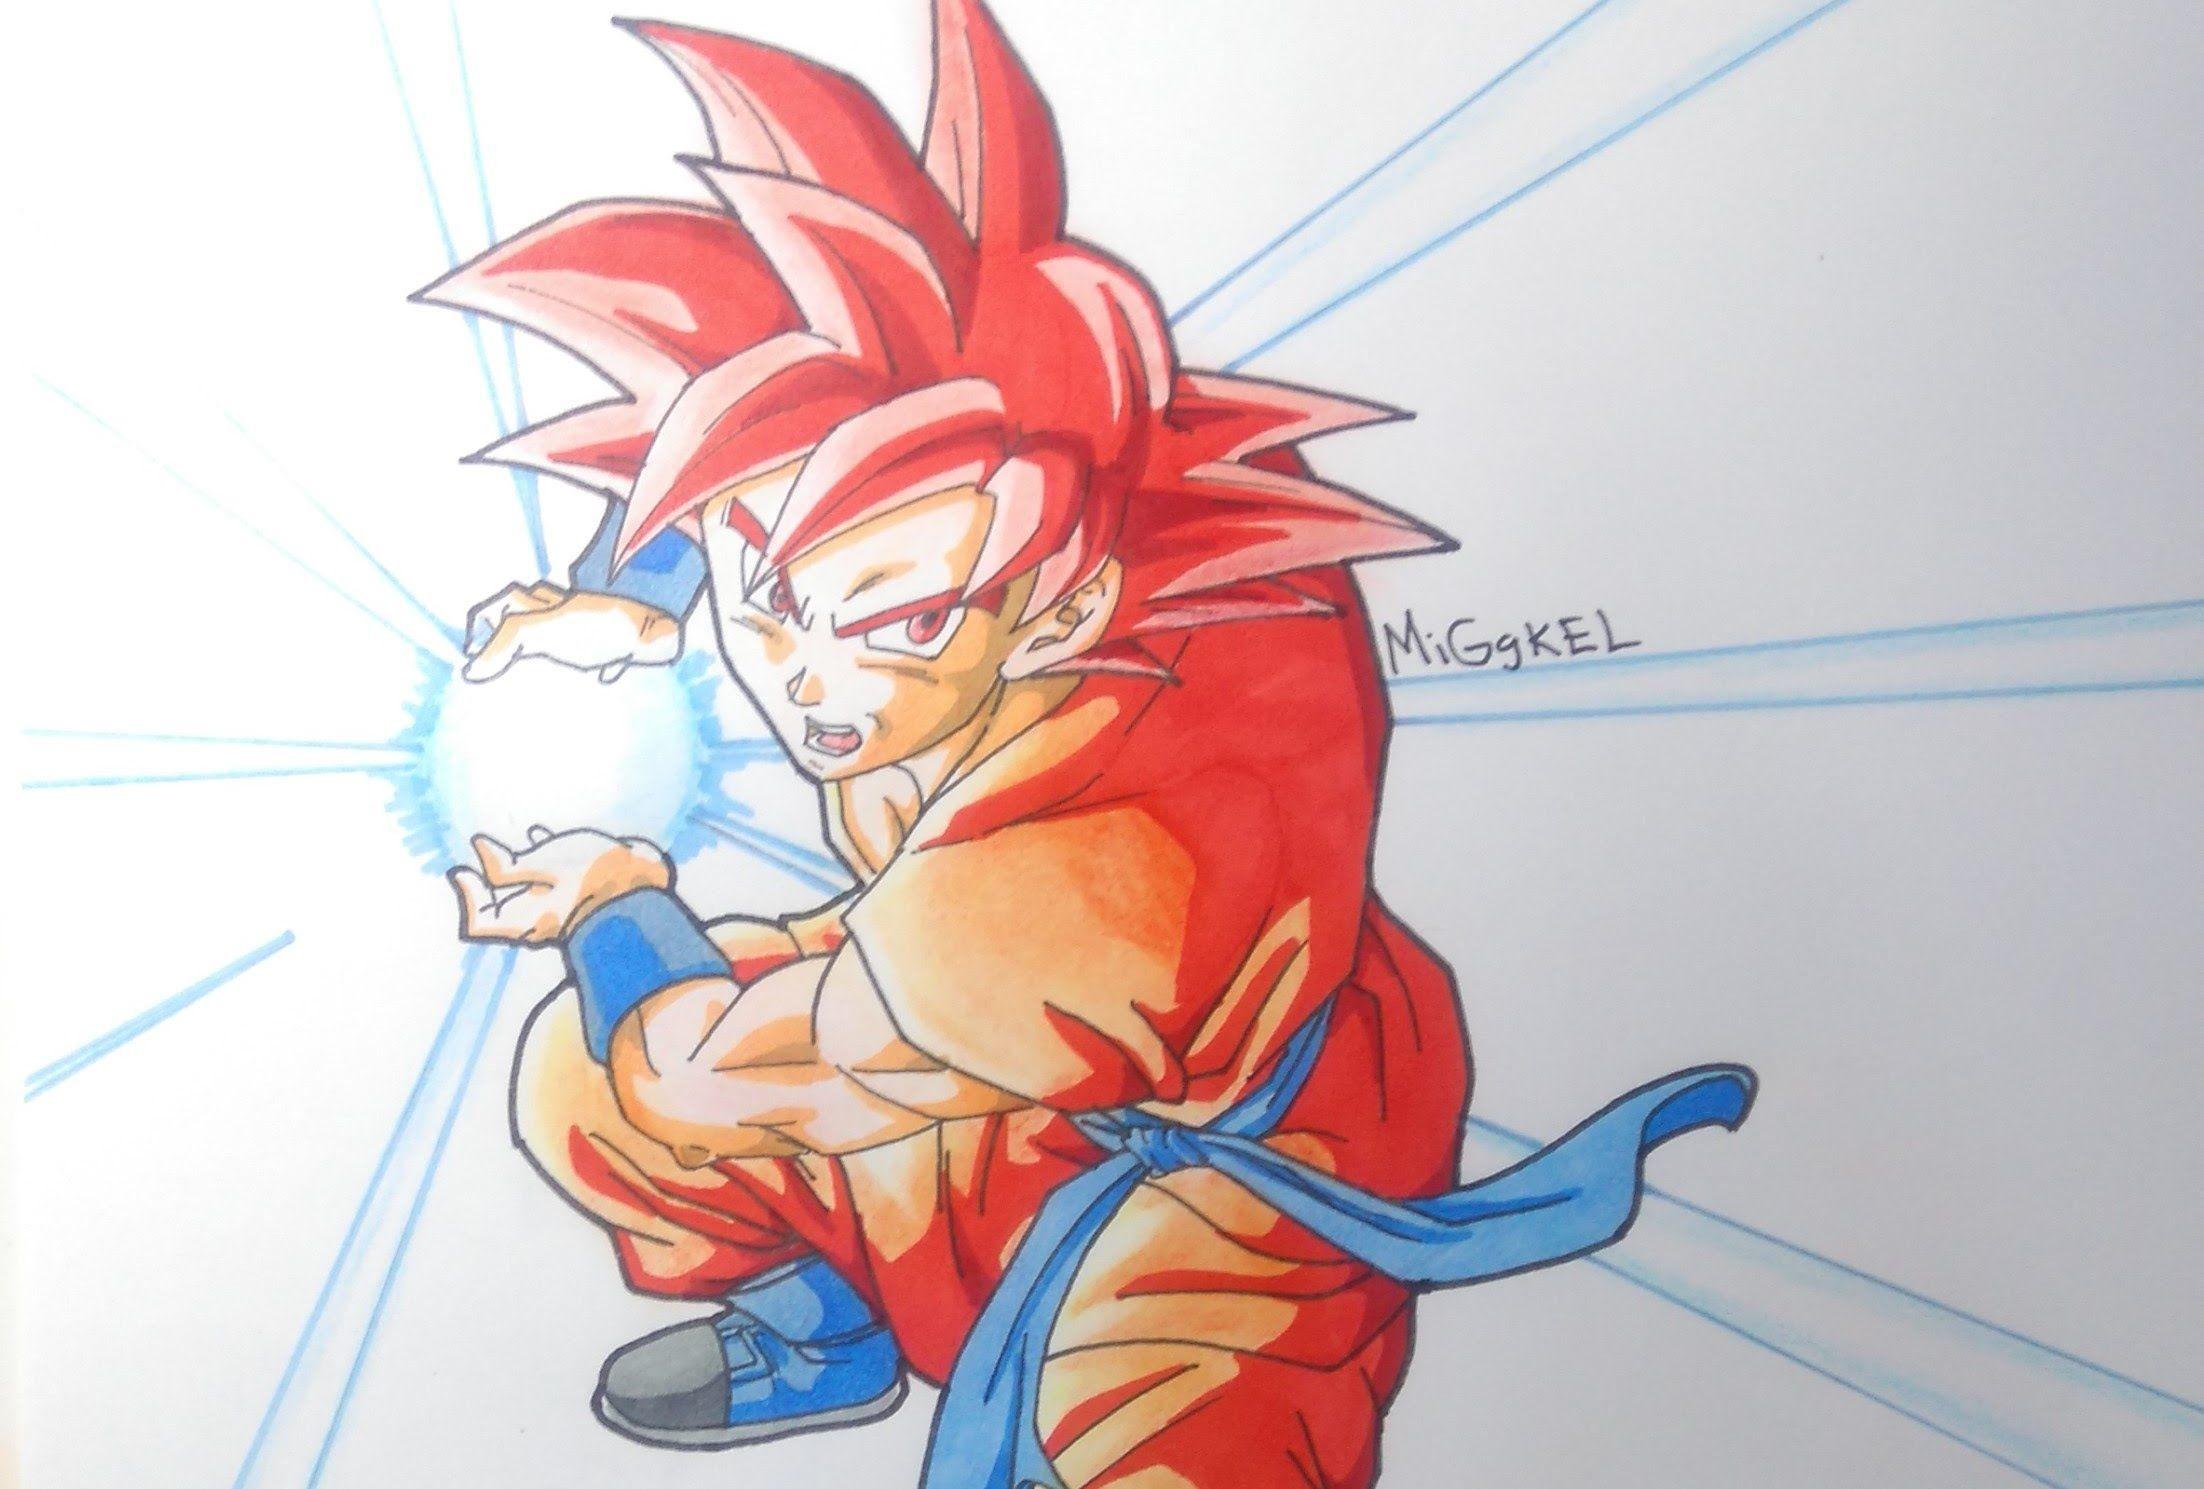 Como Dibujar A Goku Super Sayayin: Dibujando A Goku Super Saiyan God Kame Hame Ha. Drawing